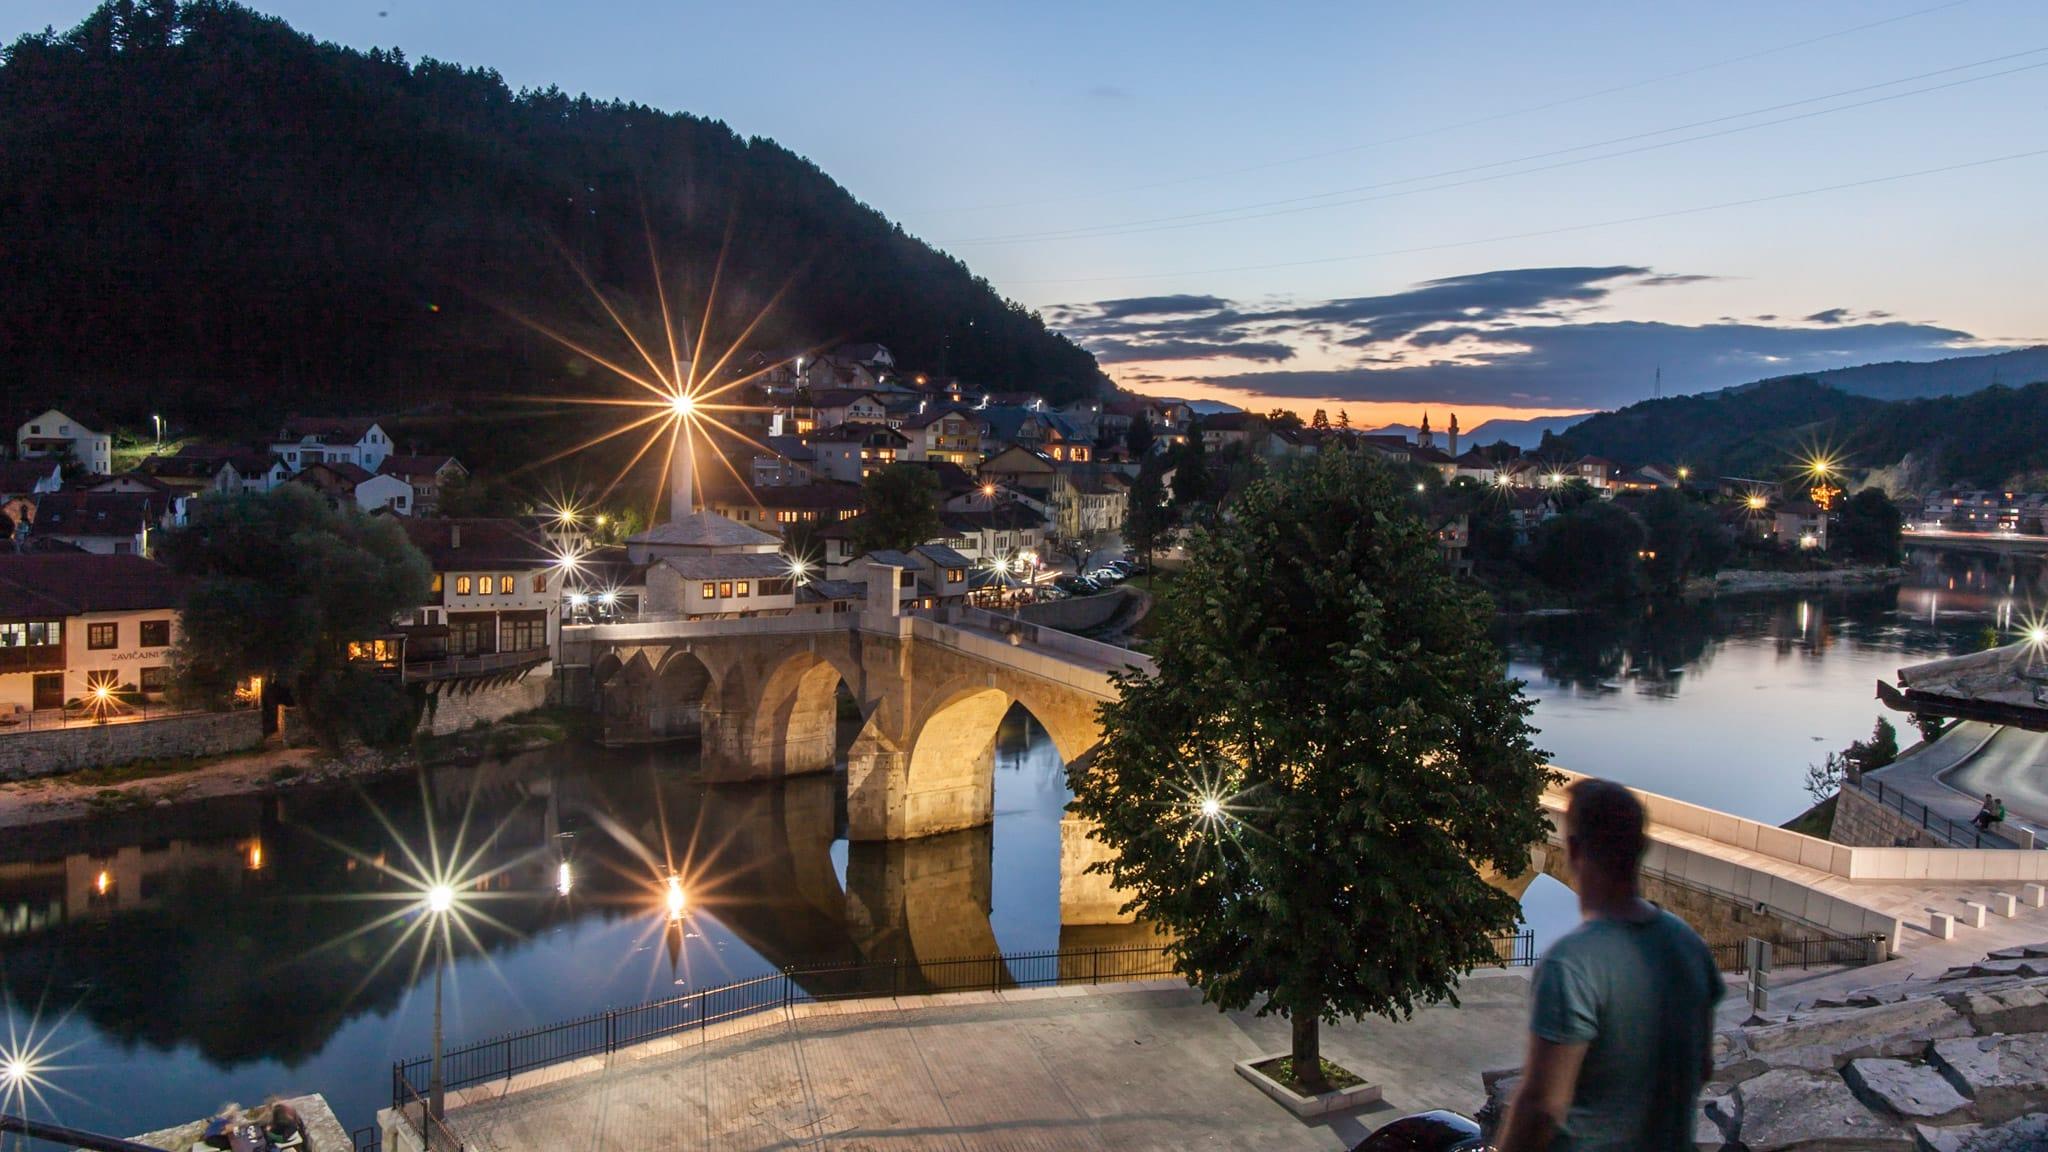 Konjic, Bosnia & Herzegovina The Best Hidden Places Europe